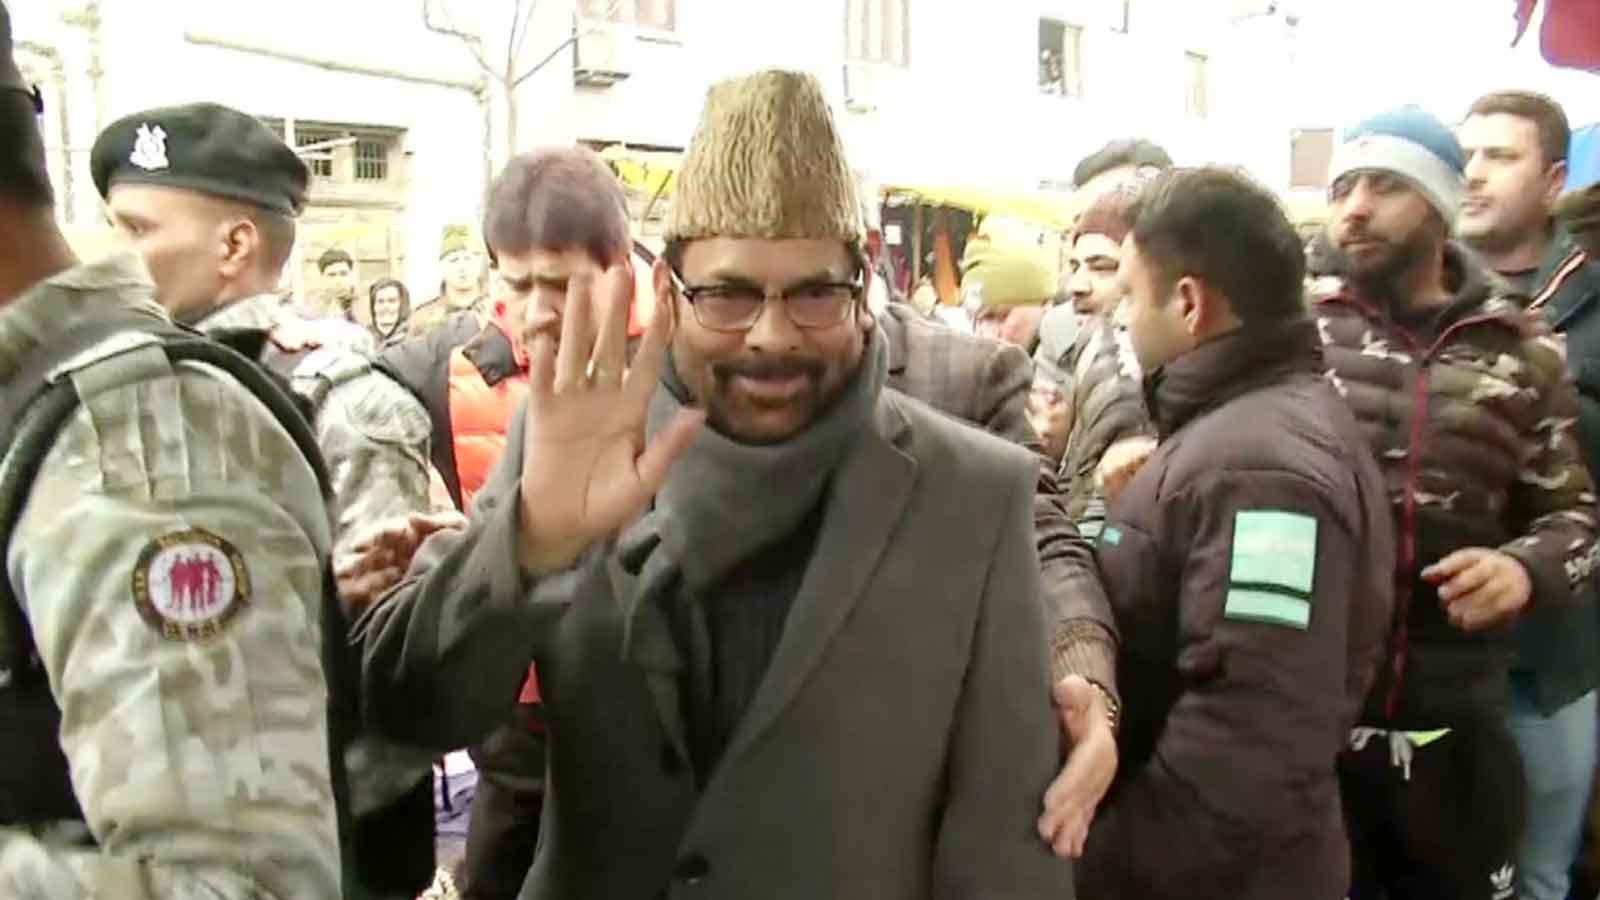 mukhtar-abbas-naqvi-interacts-with-locals-at-srinagars-lal-chowk